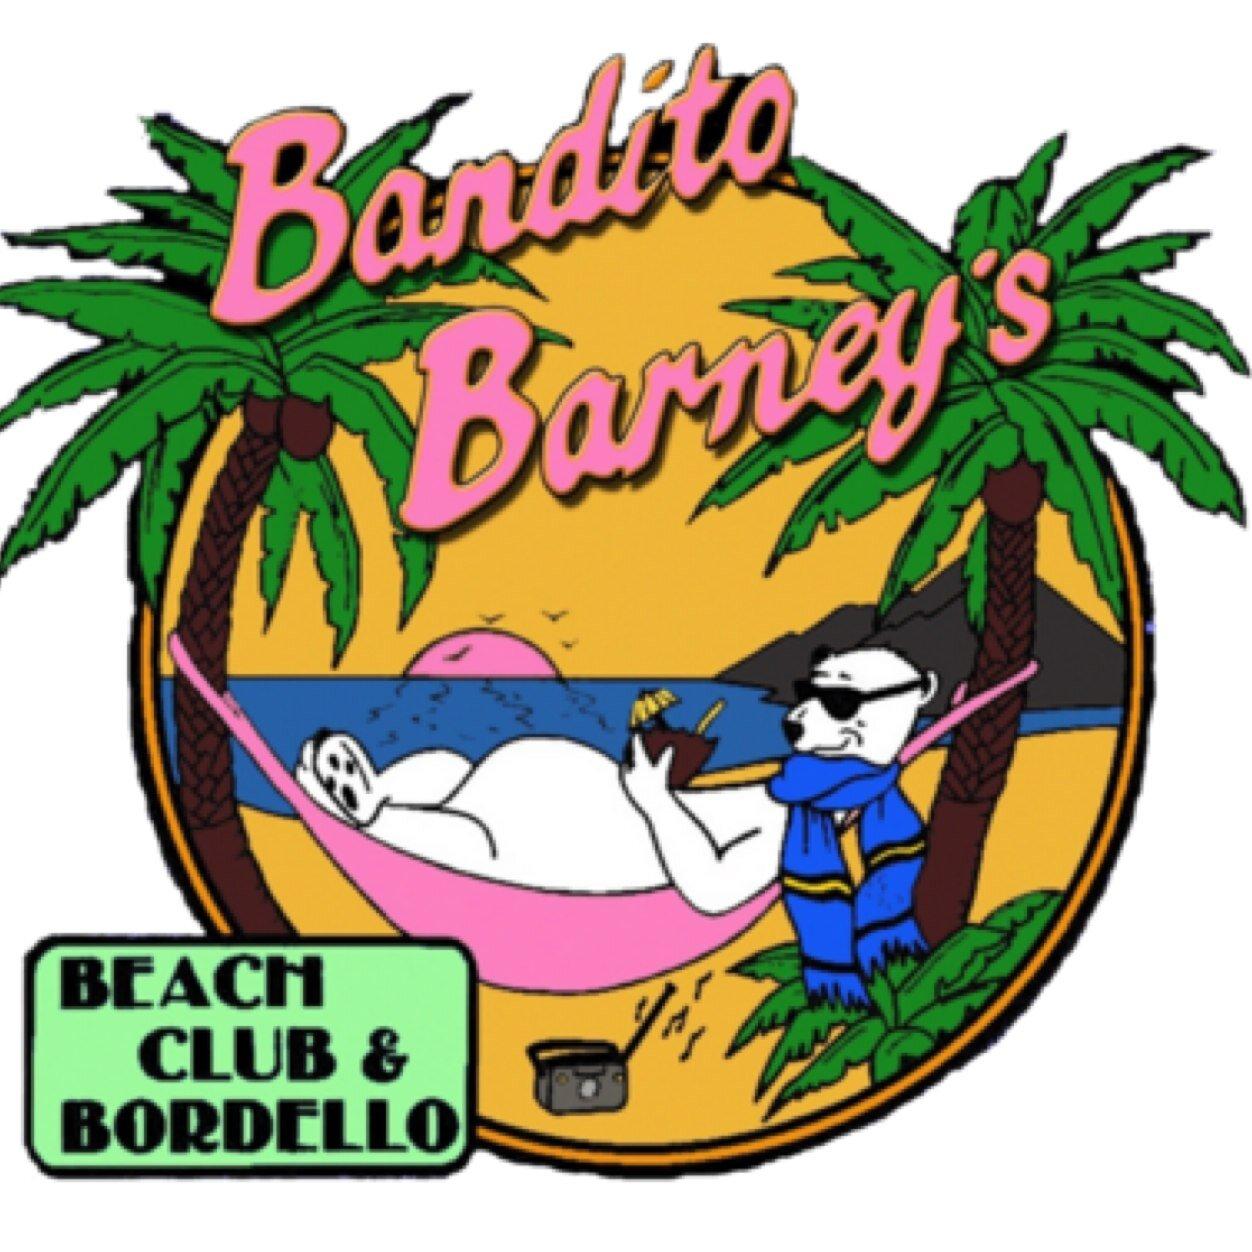 Bandito Barney\'s Beach Club on Twitter: \